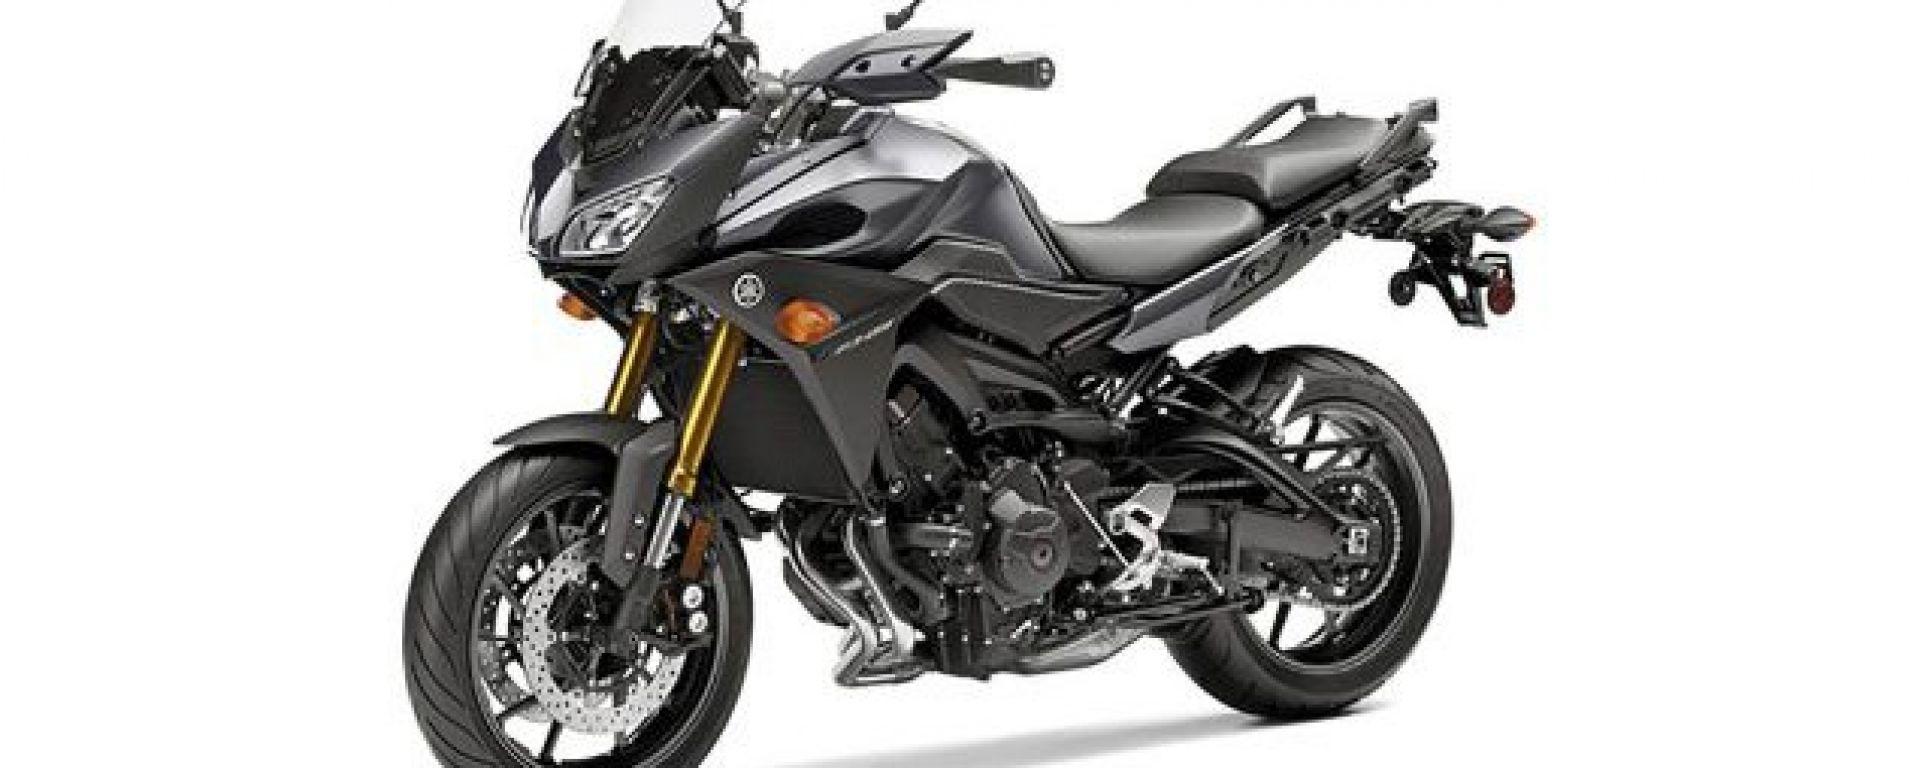 Yamaha TDM 2015: una foto in rete